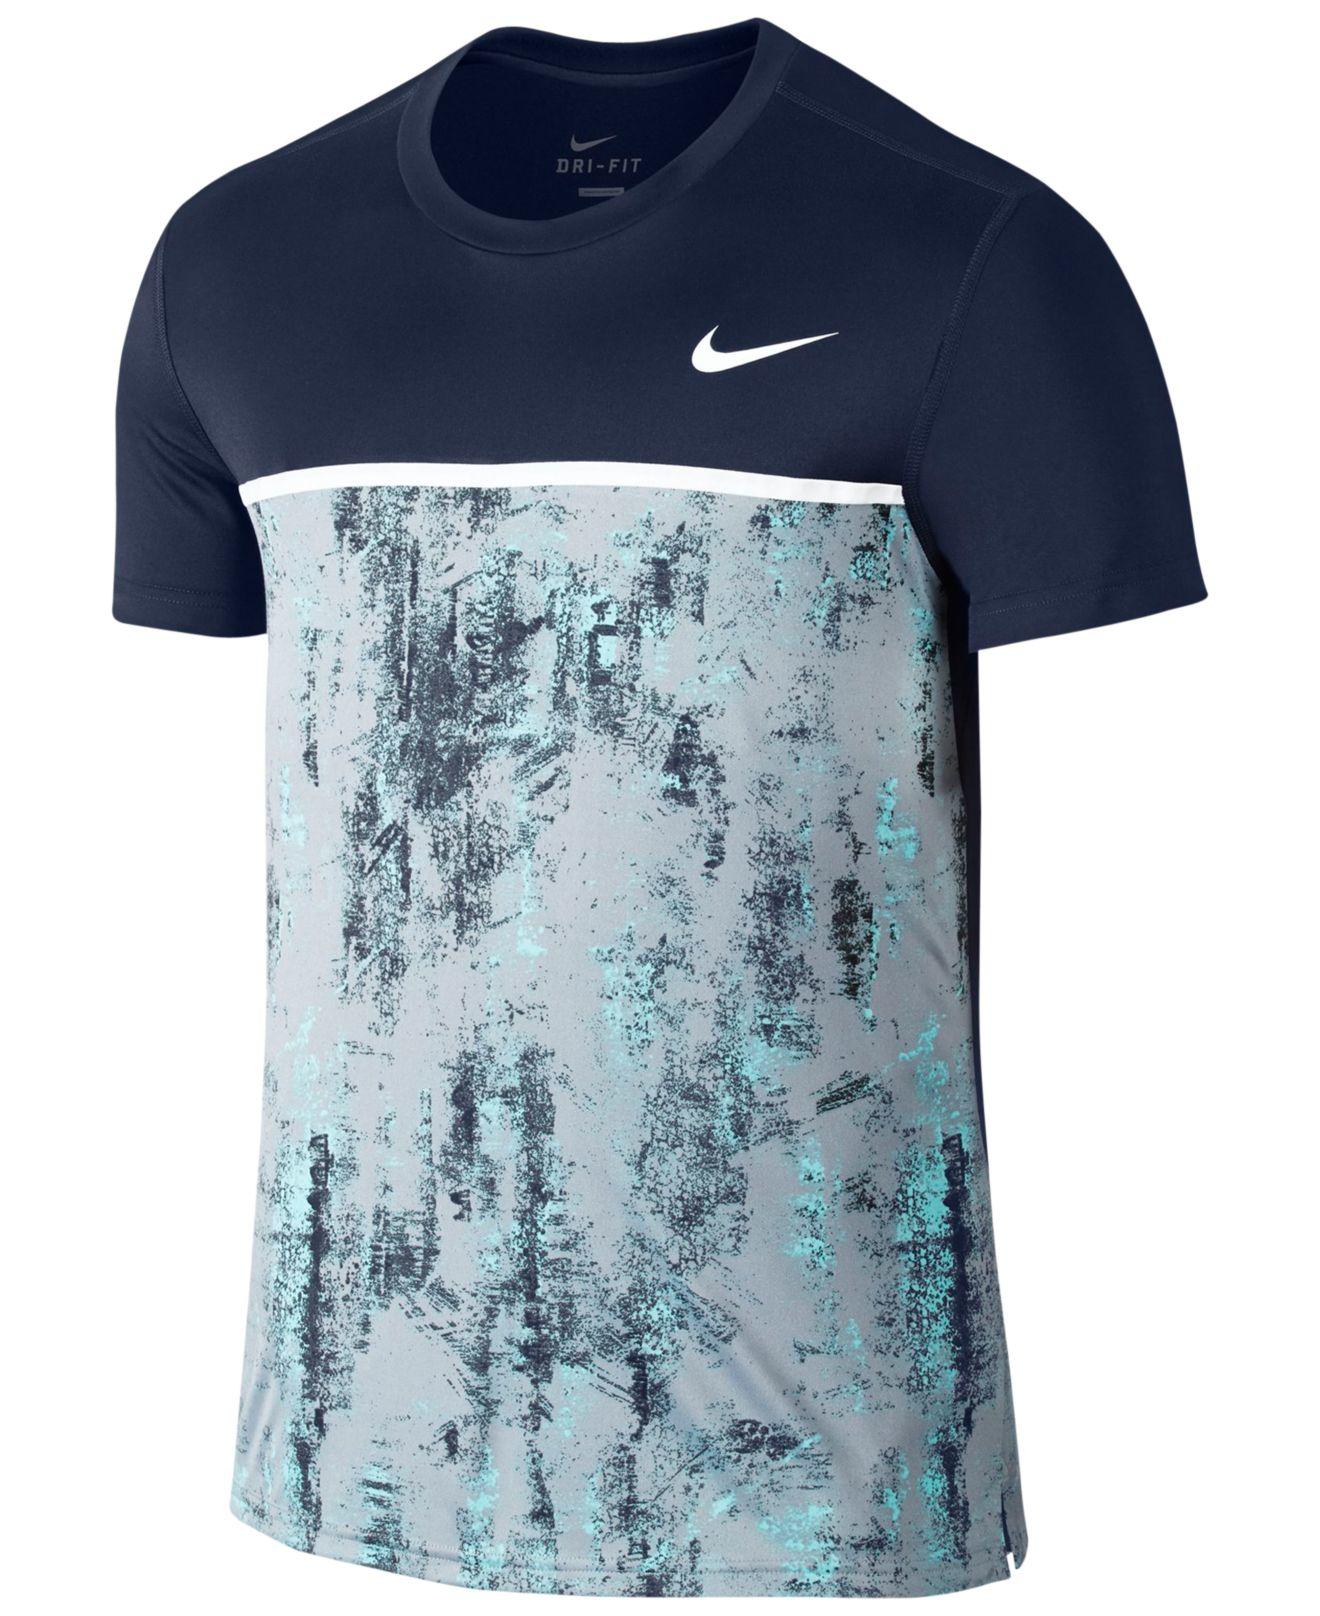 nike shirt navy blue